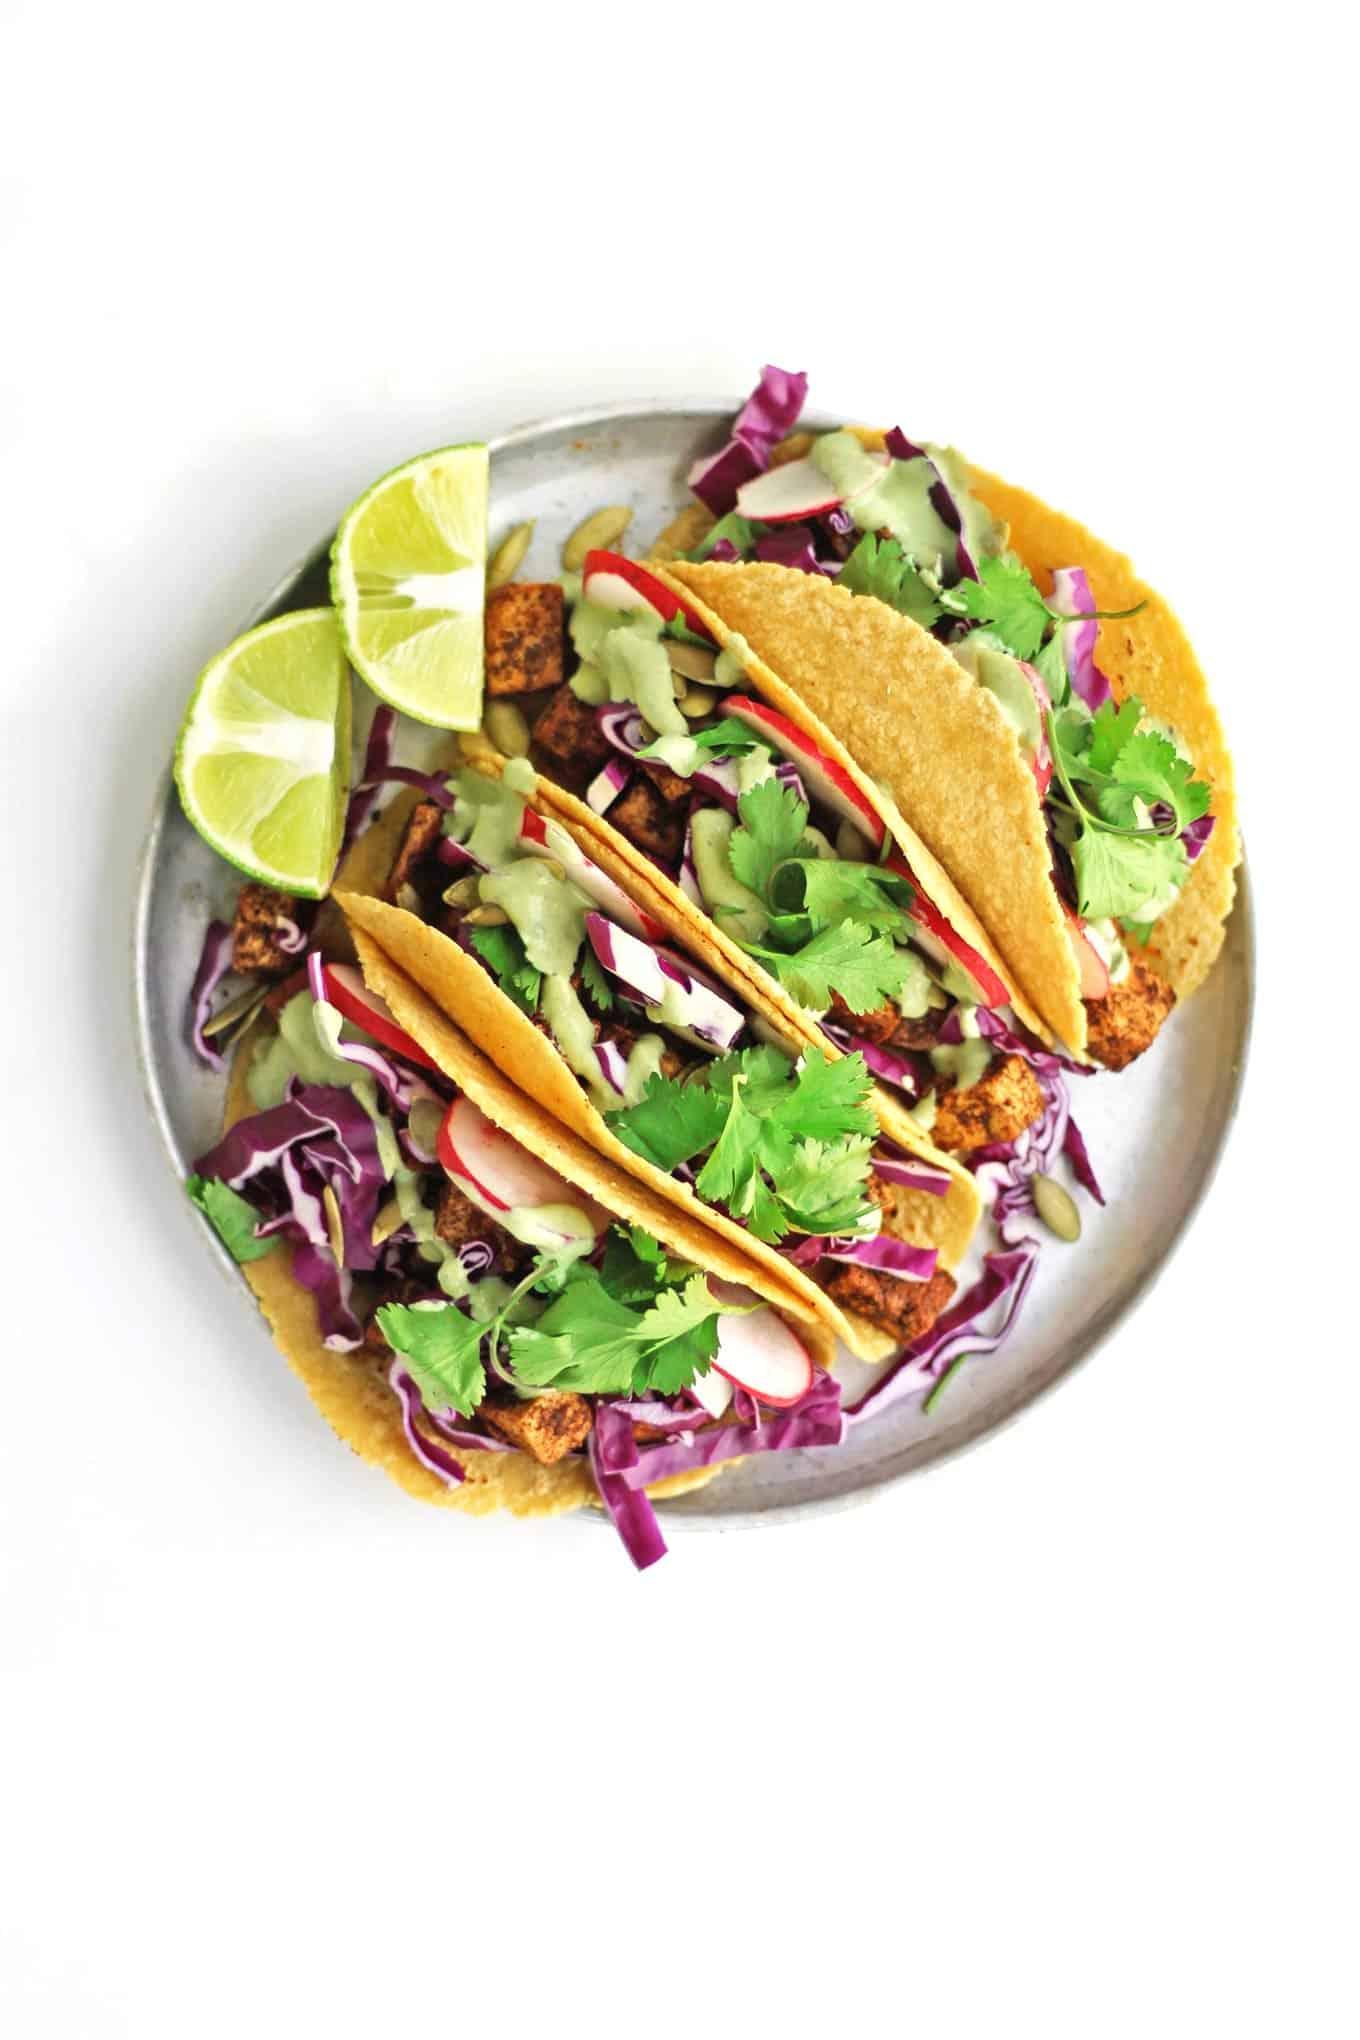 Vegan tacos with cilantro